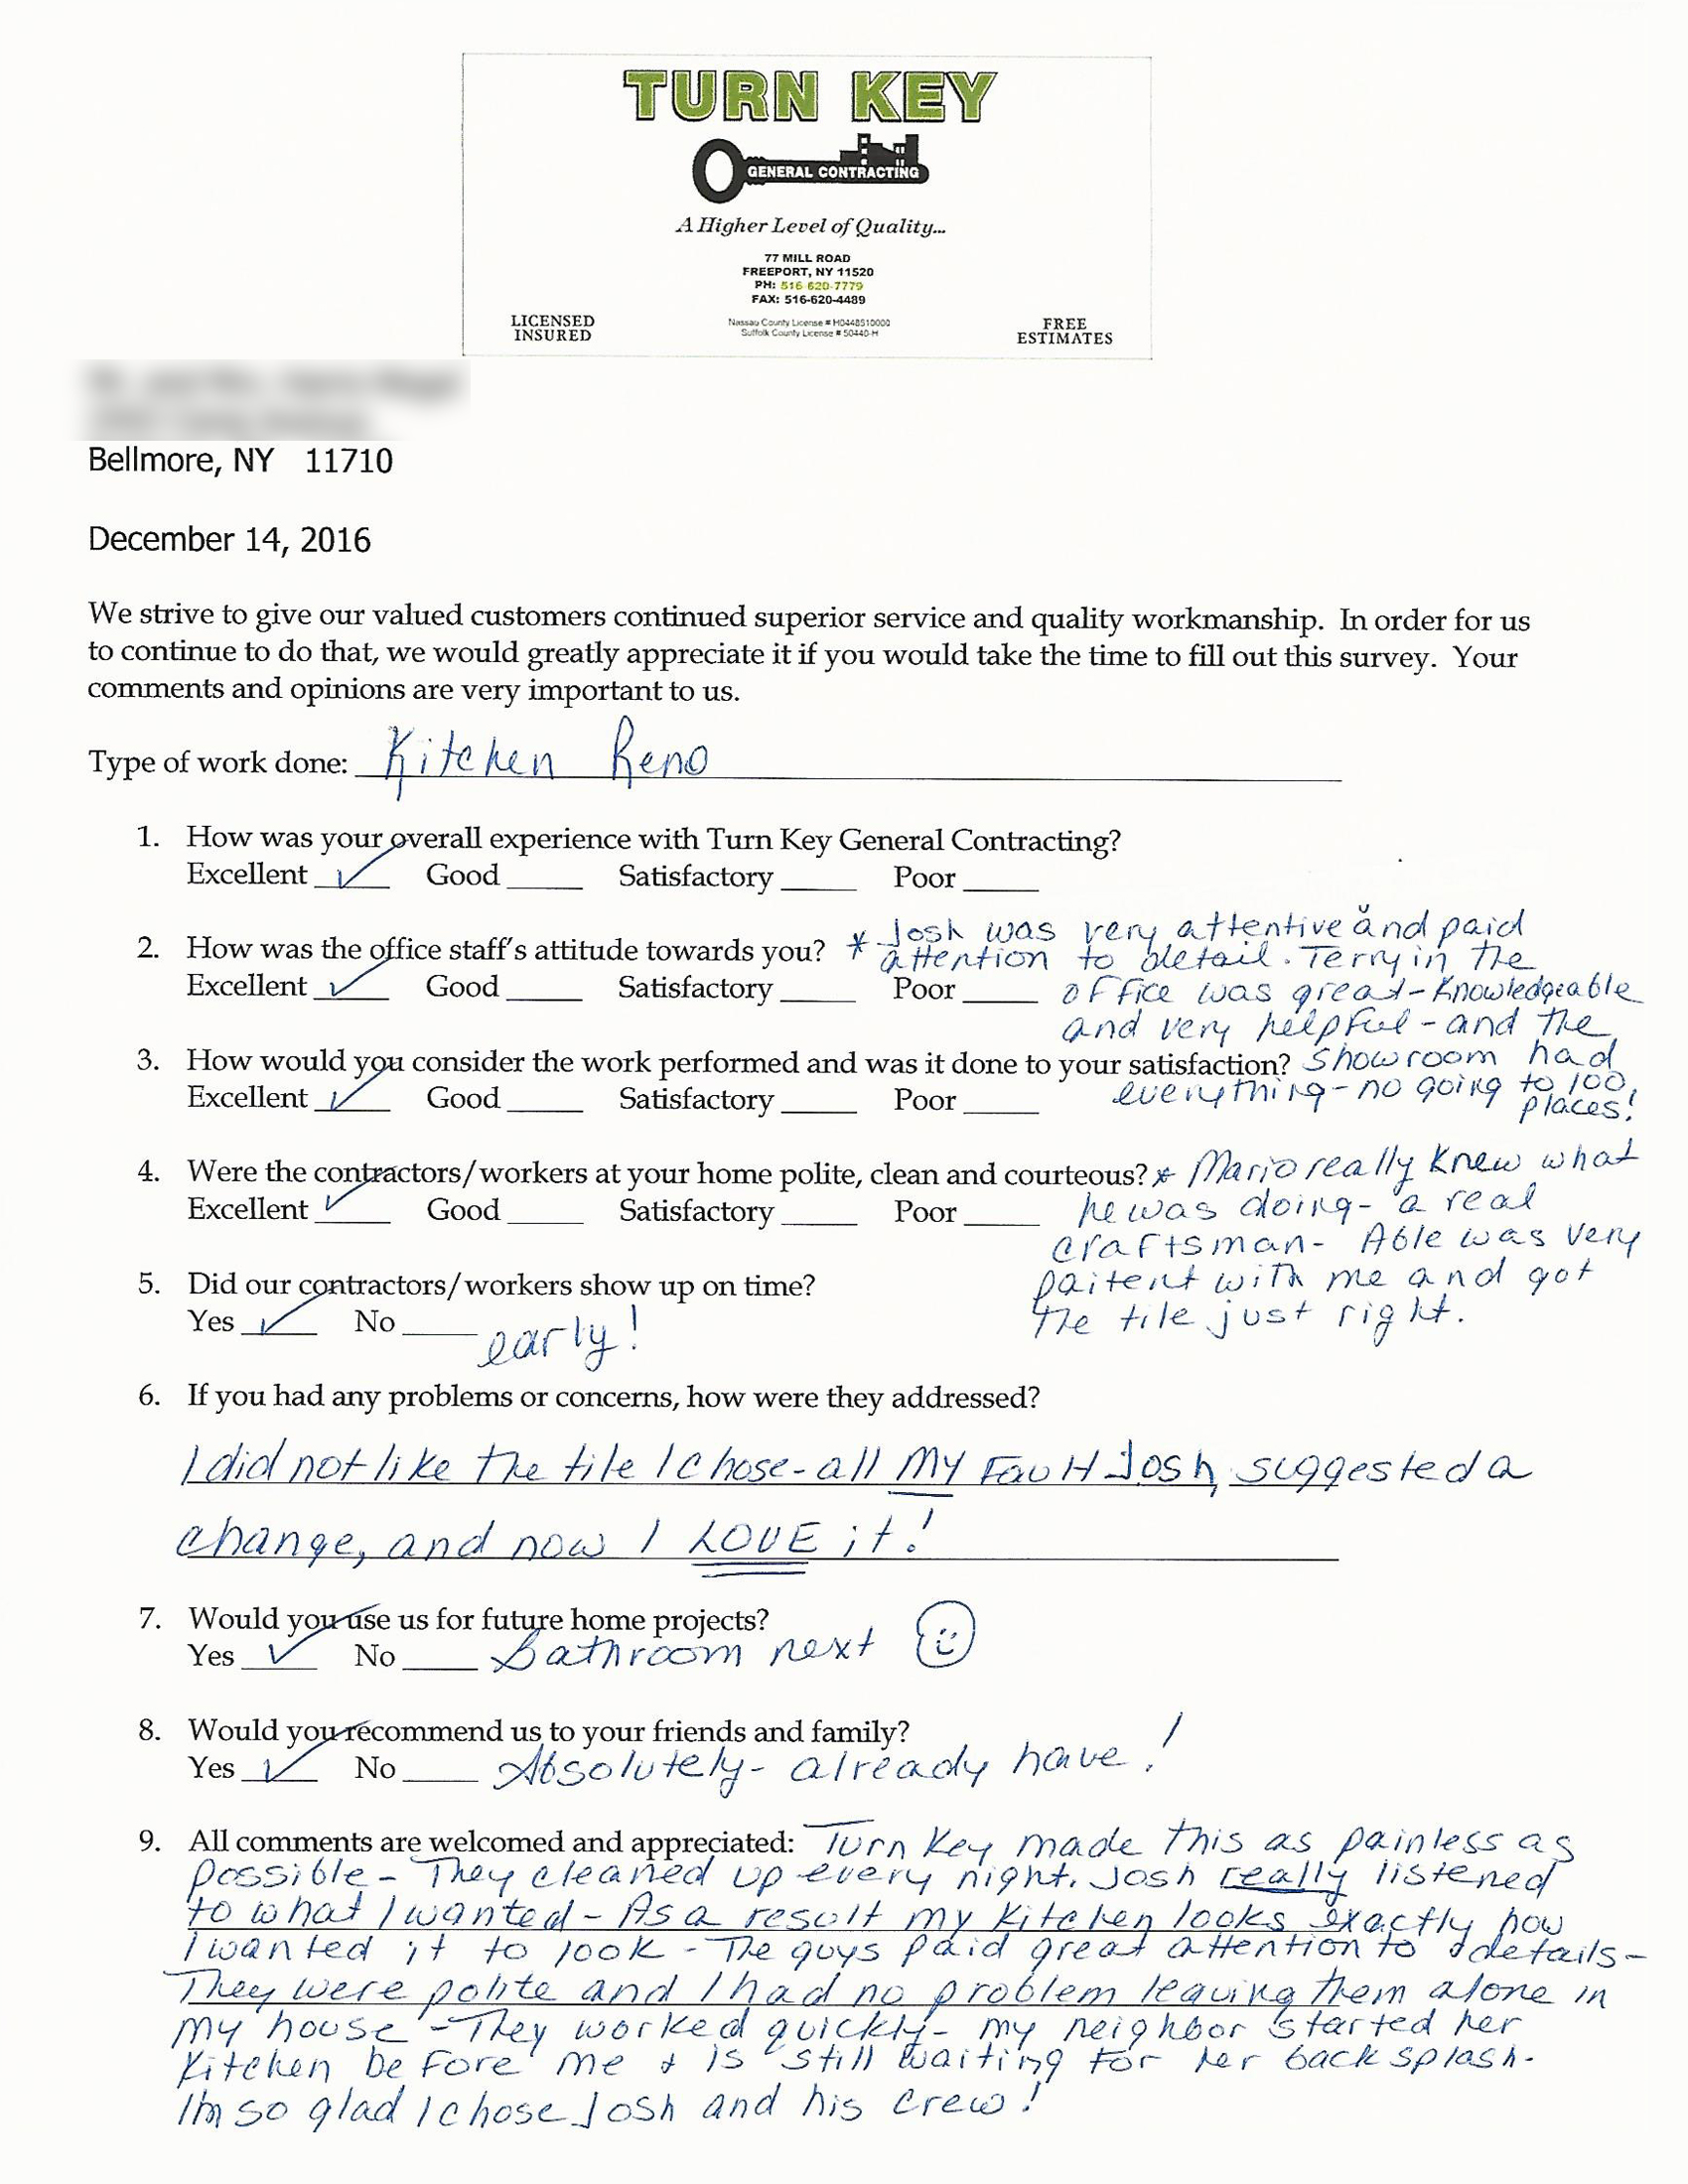 Testimonial 2016-12 Bellmore